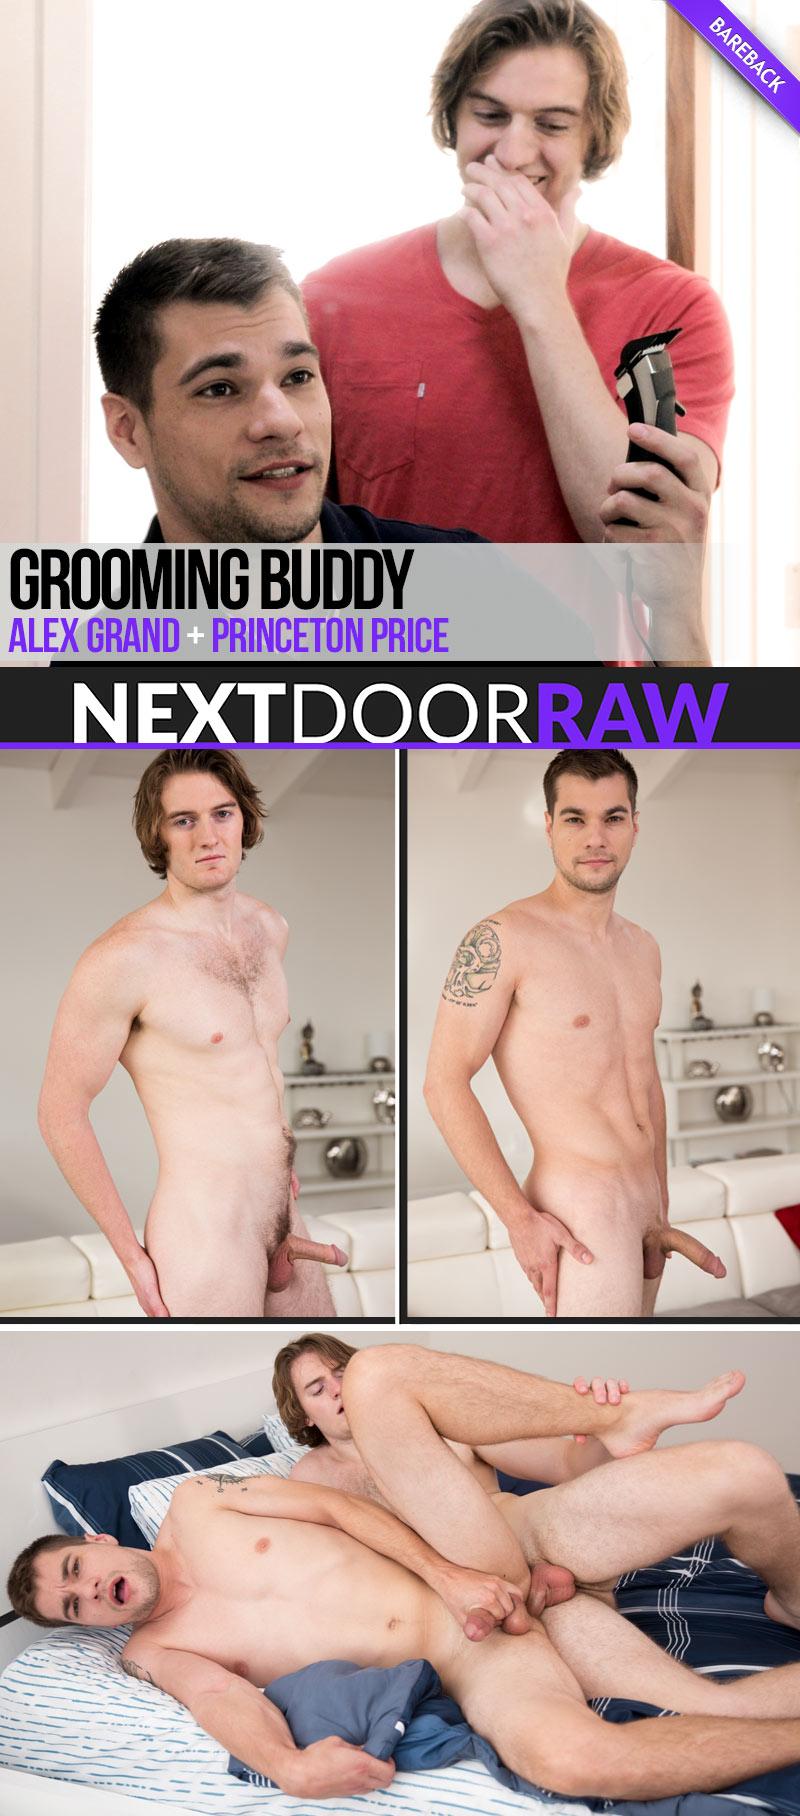 Grooming Buddy (Alex Grand Fucks Princeton Price) at NextDoorRAW!